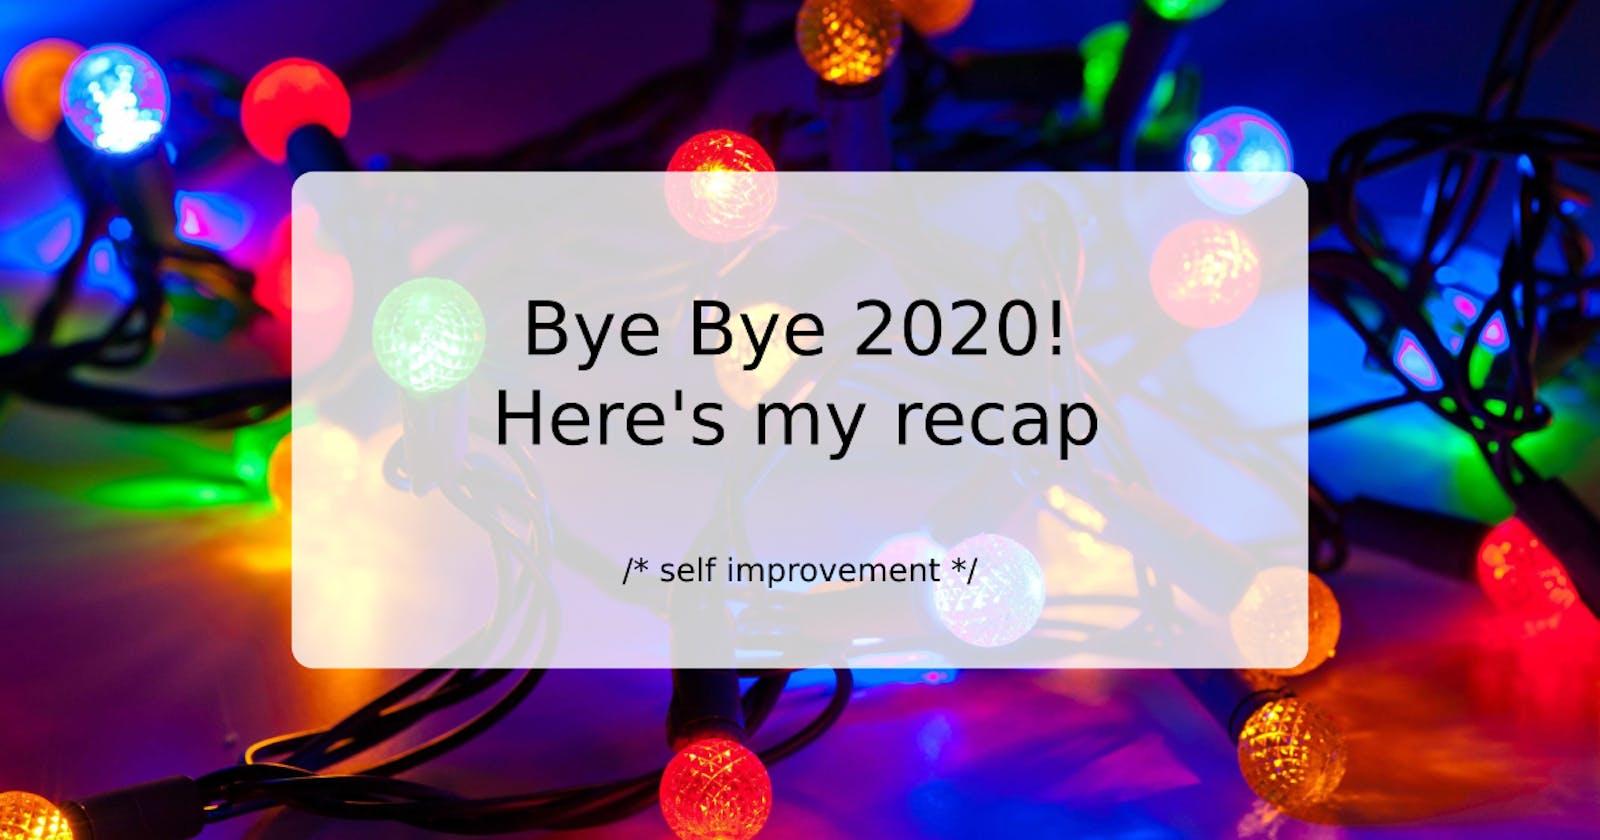 Bye Bye 2020! Here's my recap